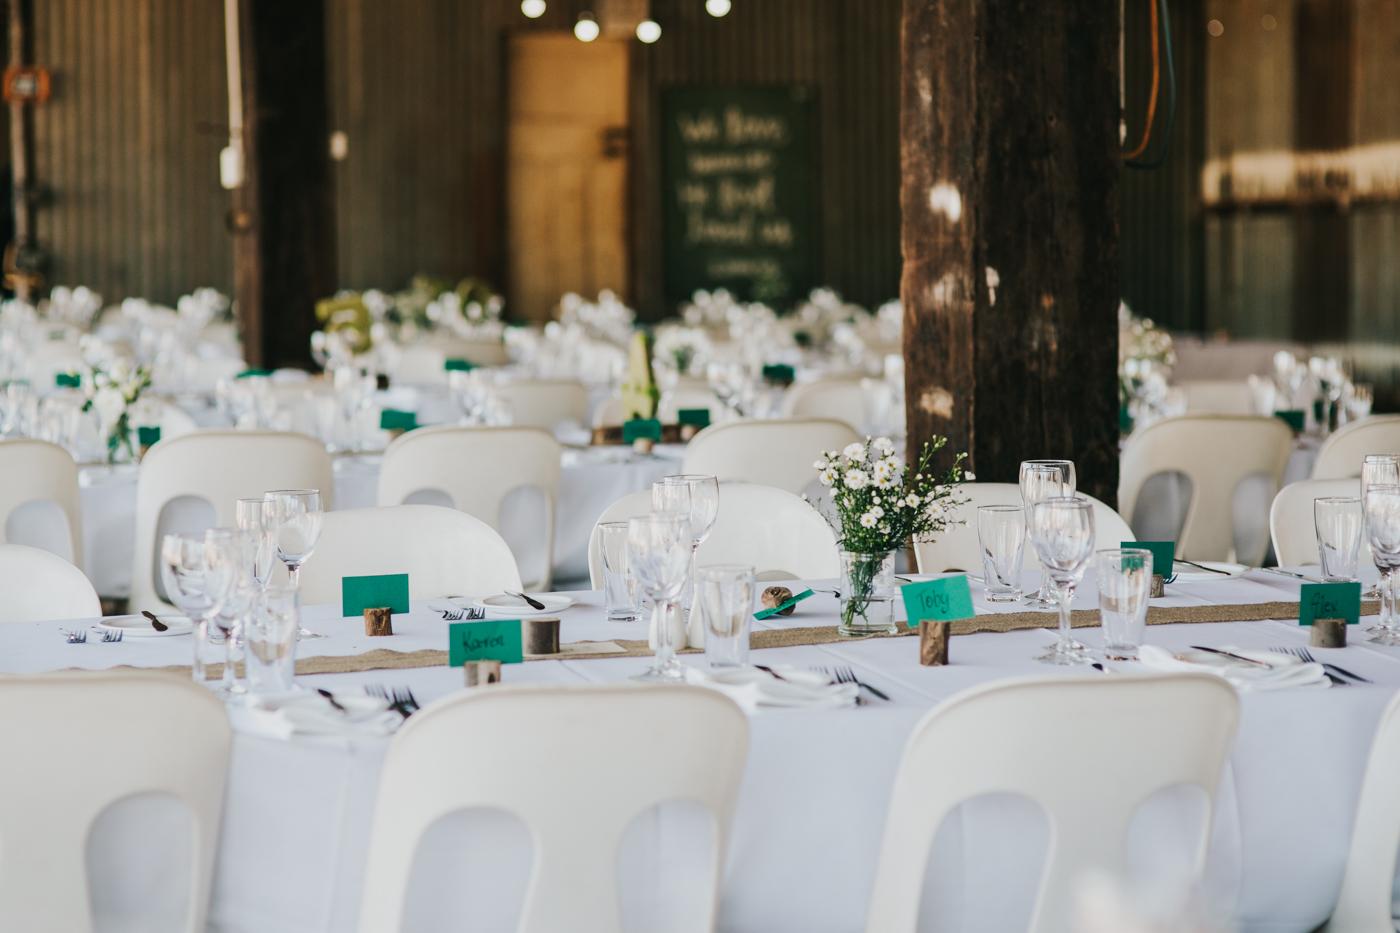 Nicolle & Jacob - Dubbo Wedding - Country Australia - Samantha Heather Photography-201.jpg